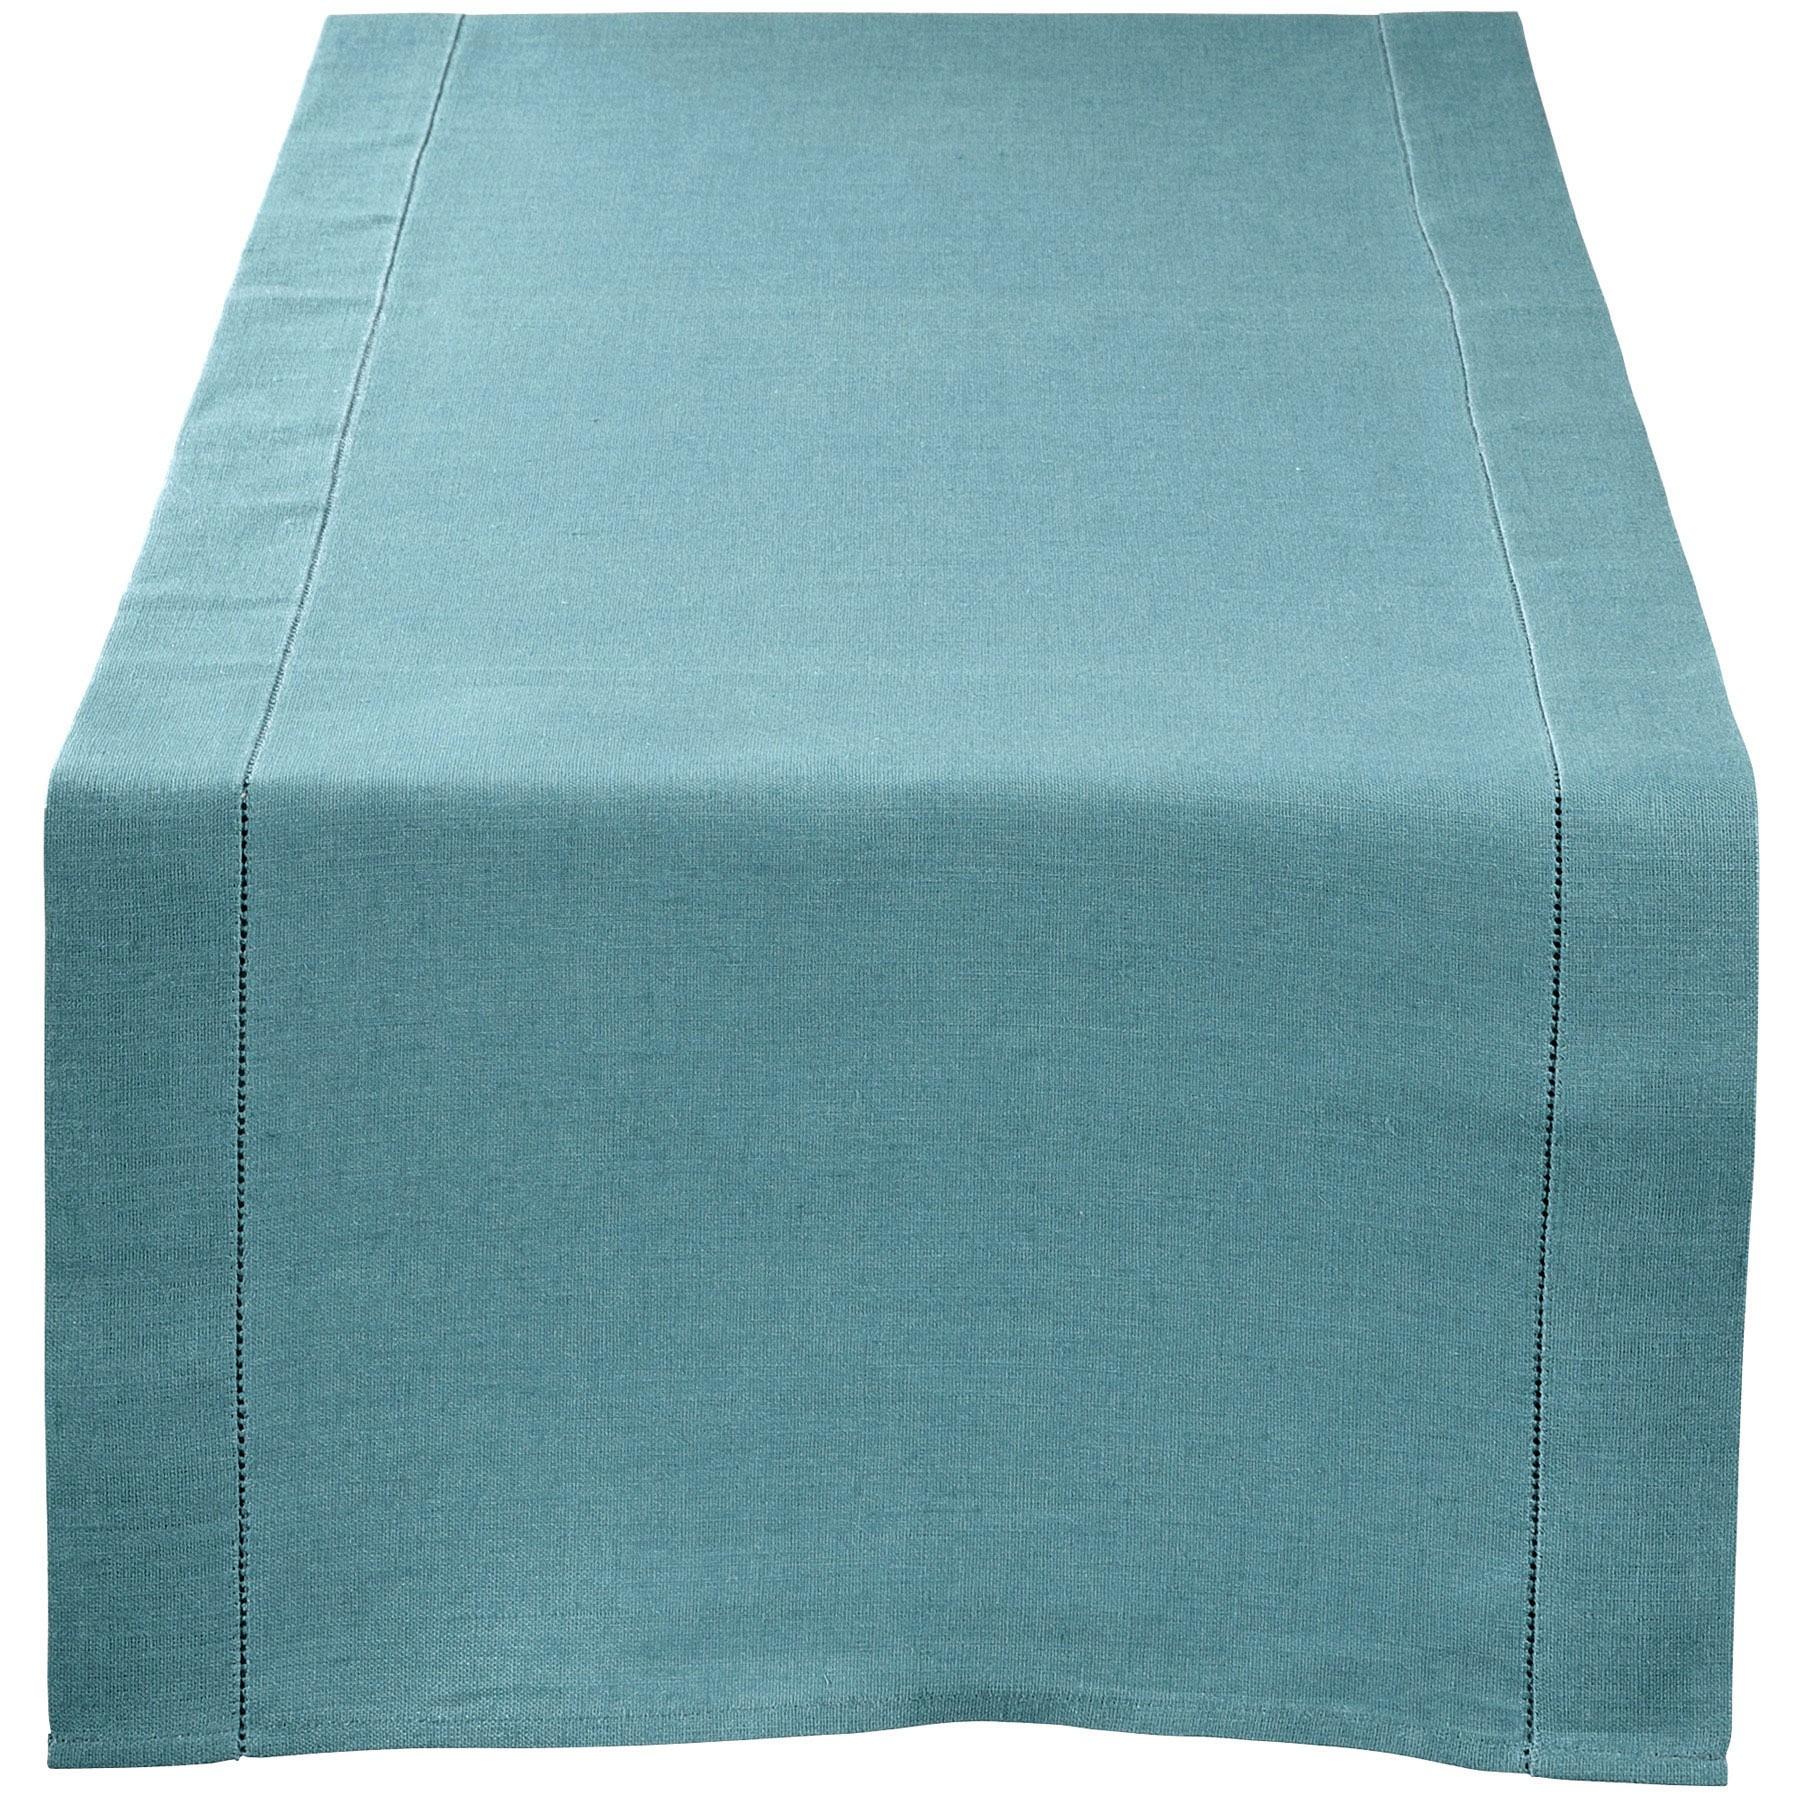 TABLE RUNNER <br />niagara blue